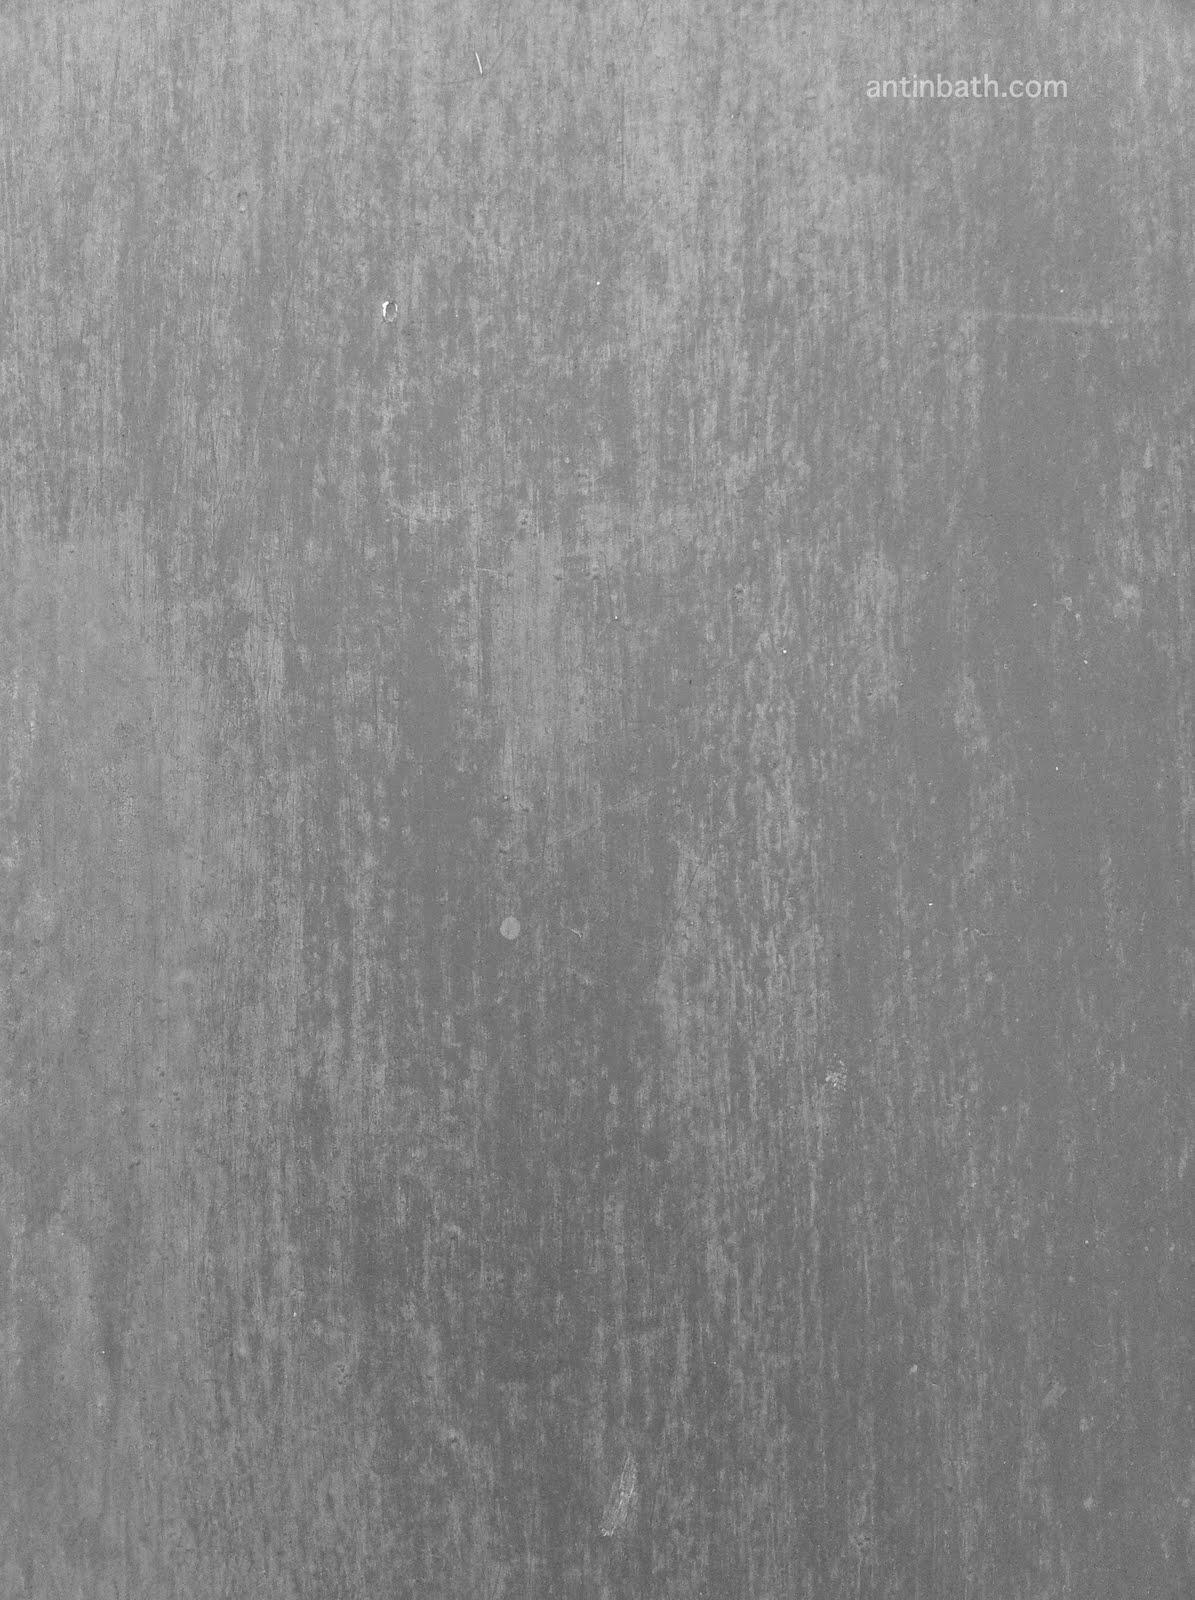 Wallpaper iphone 4 - Wallpaper Iphone 5 Wallpaper Iphone 5 Wallpaper Iphone 5 Wallpaper